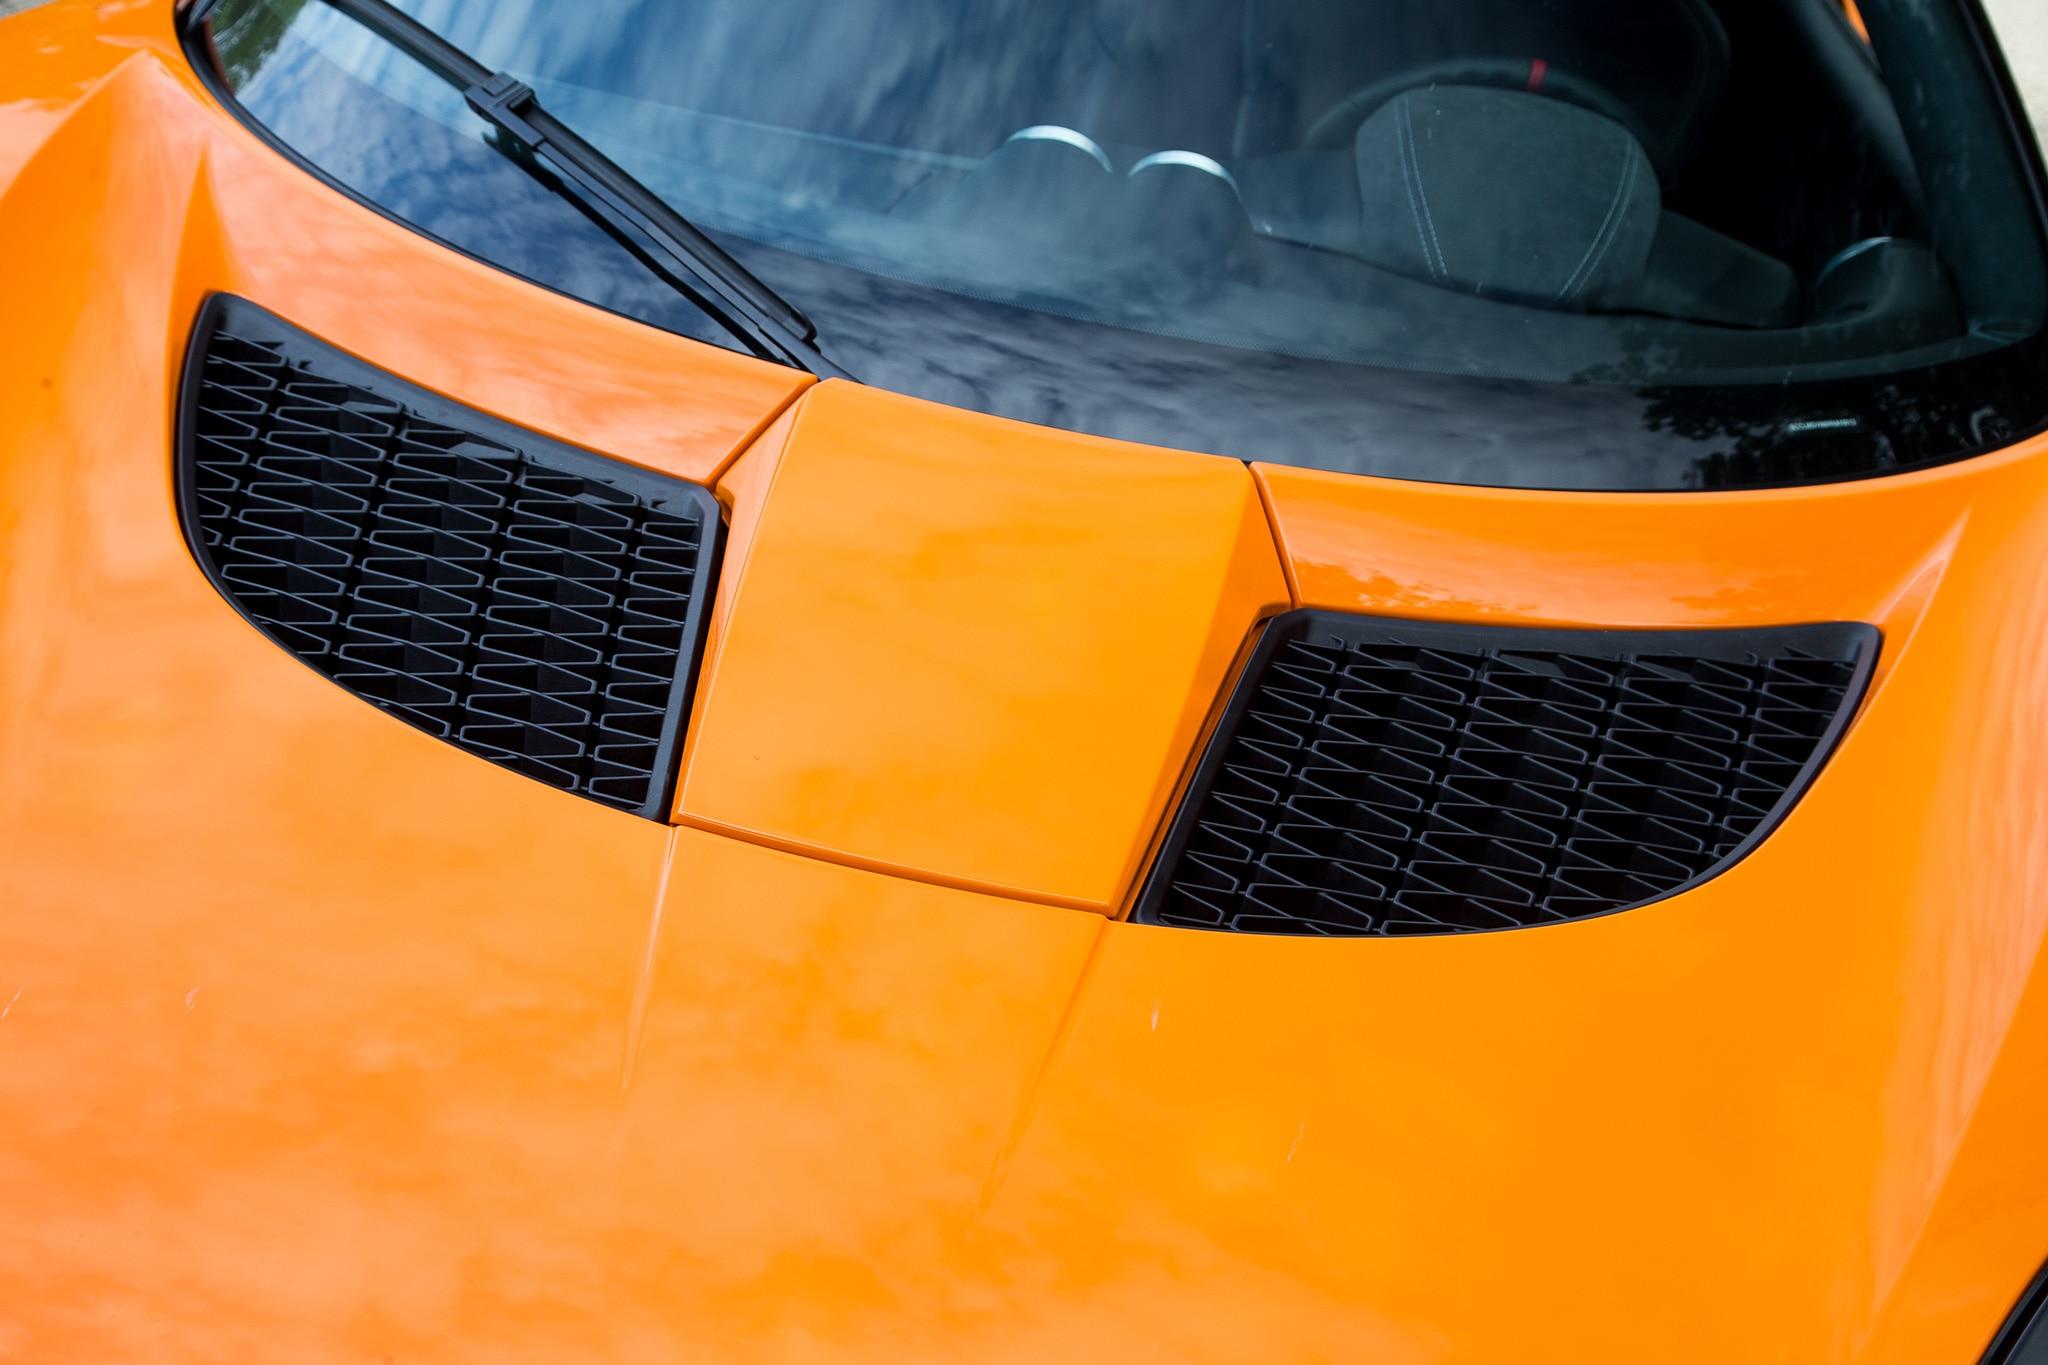 2017 Lotus Evora 400 Vents 01